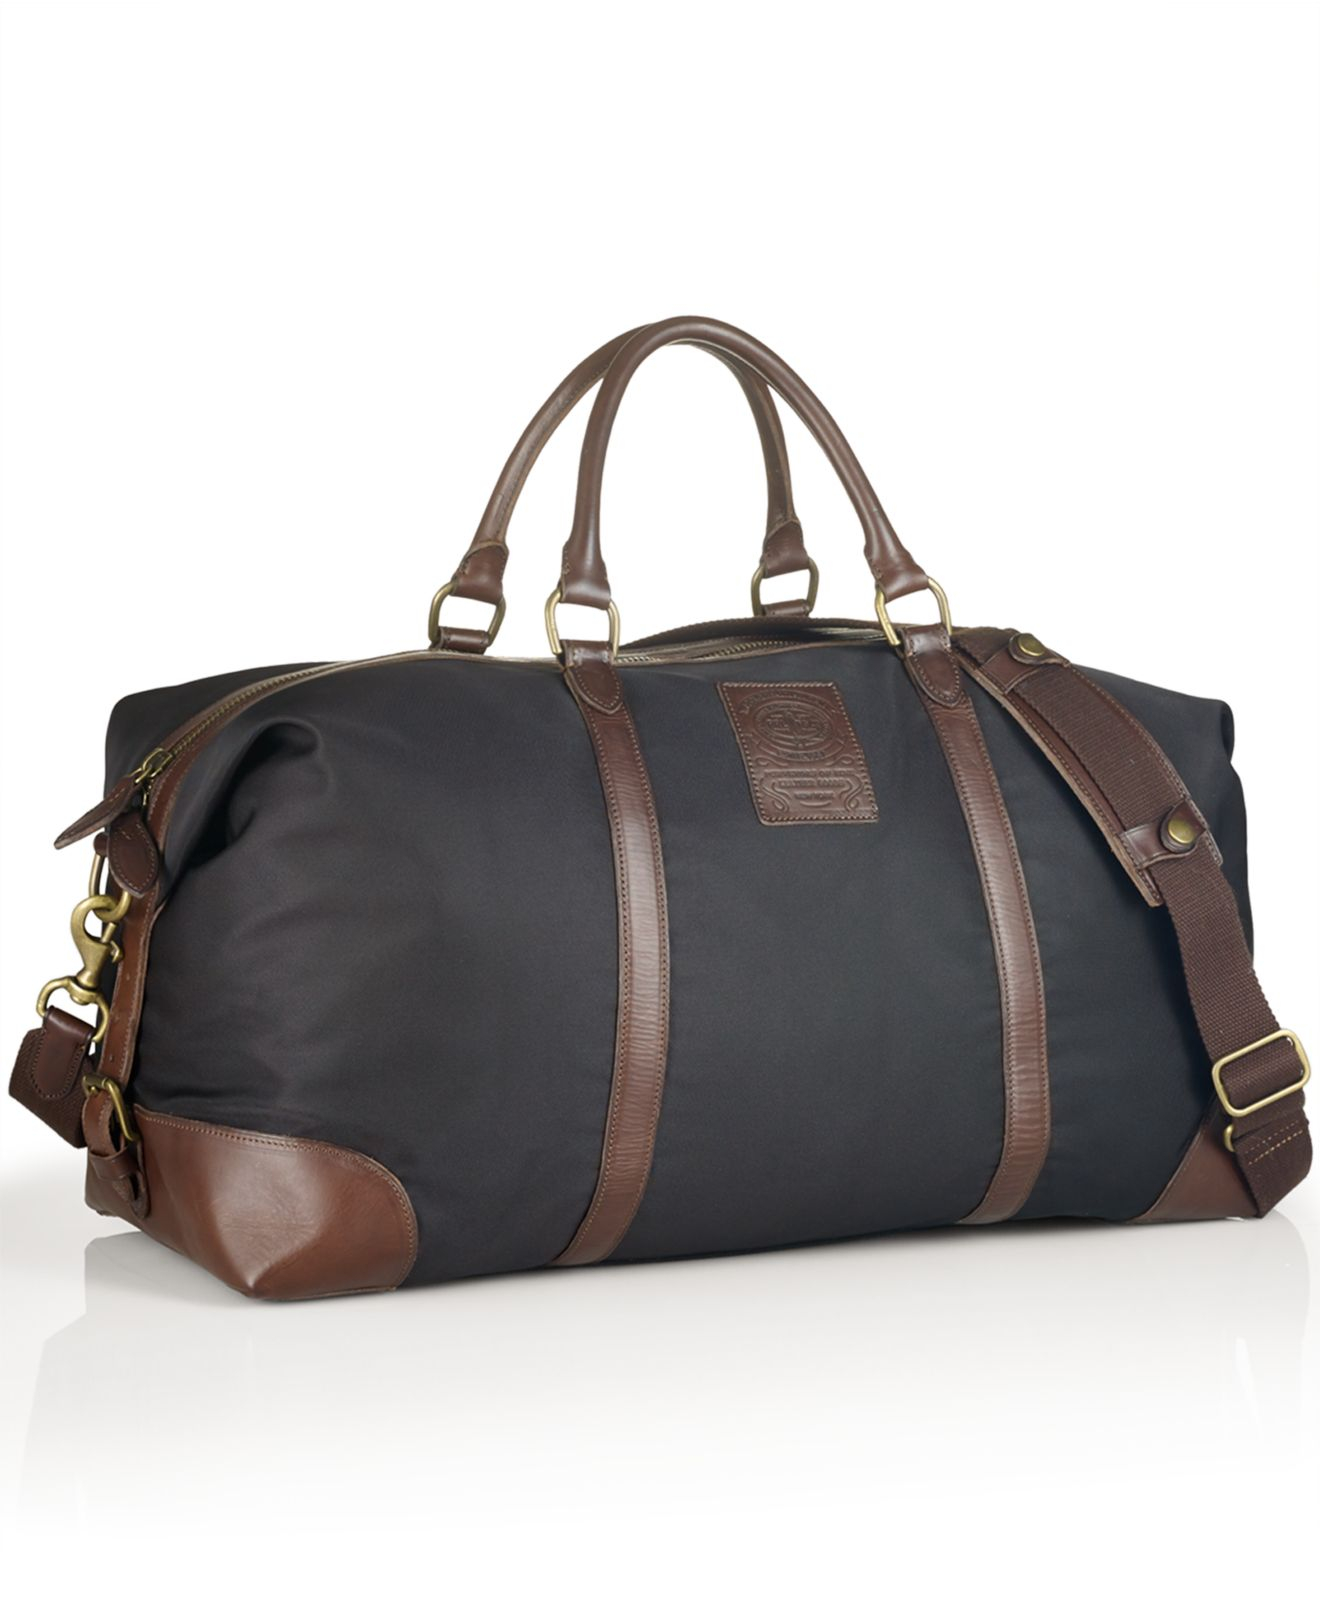 deea1d5478e4 Lyst - Polo Ralph Lauren Large Nylon Duffel Bag in Black for Men